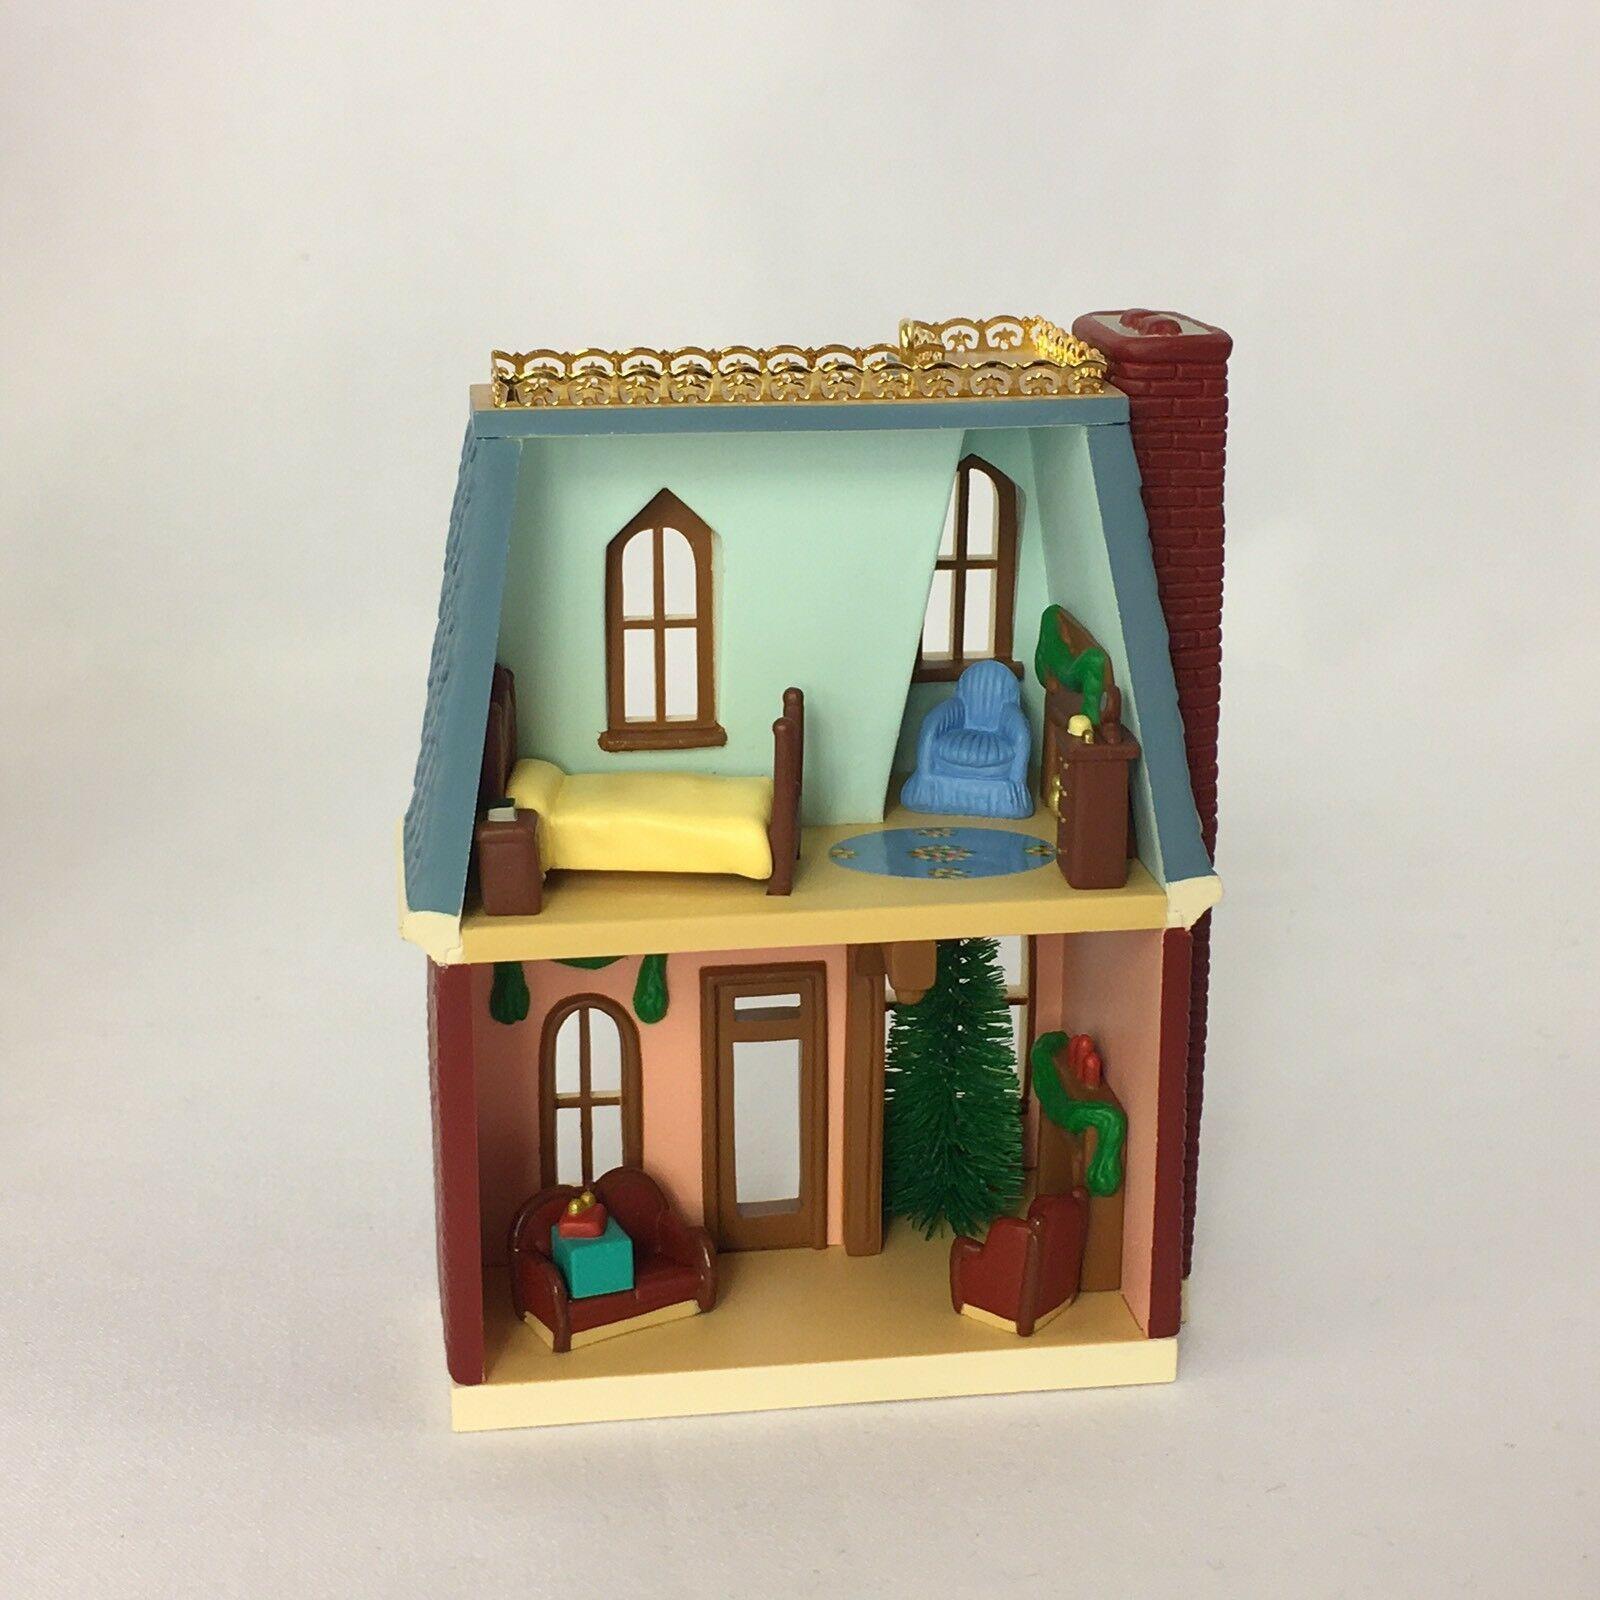 Hallmark 1999 Keepsake Ornament House on Holly Lane Nostagic Houses Shops #16